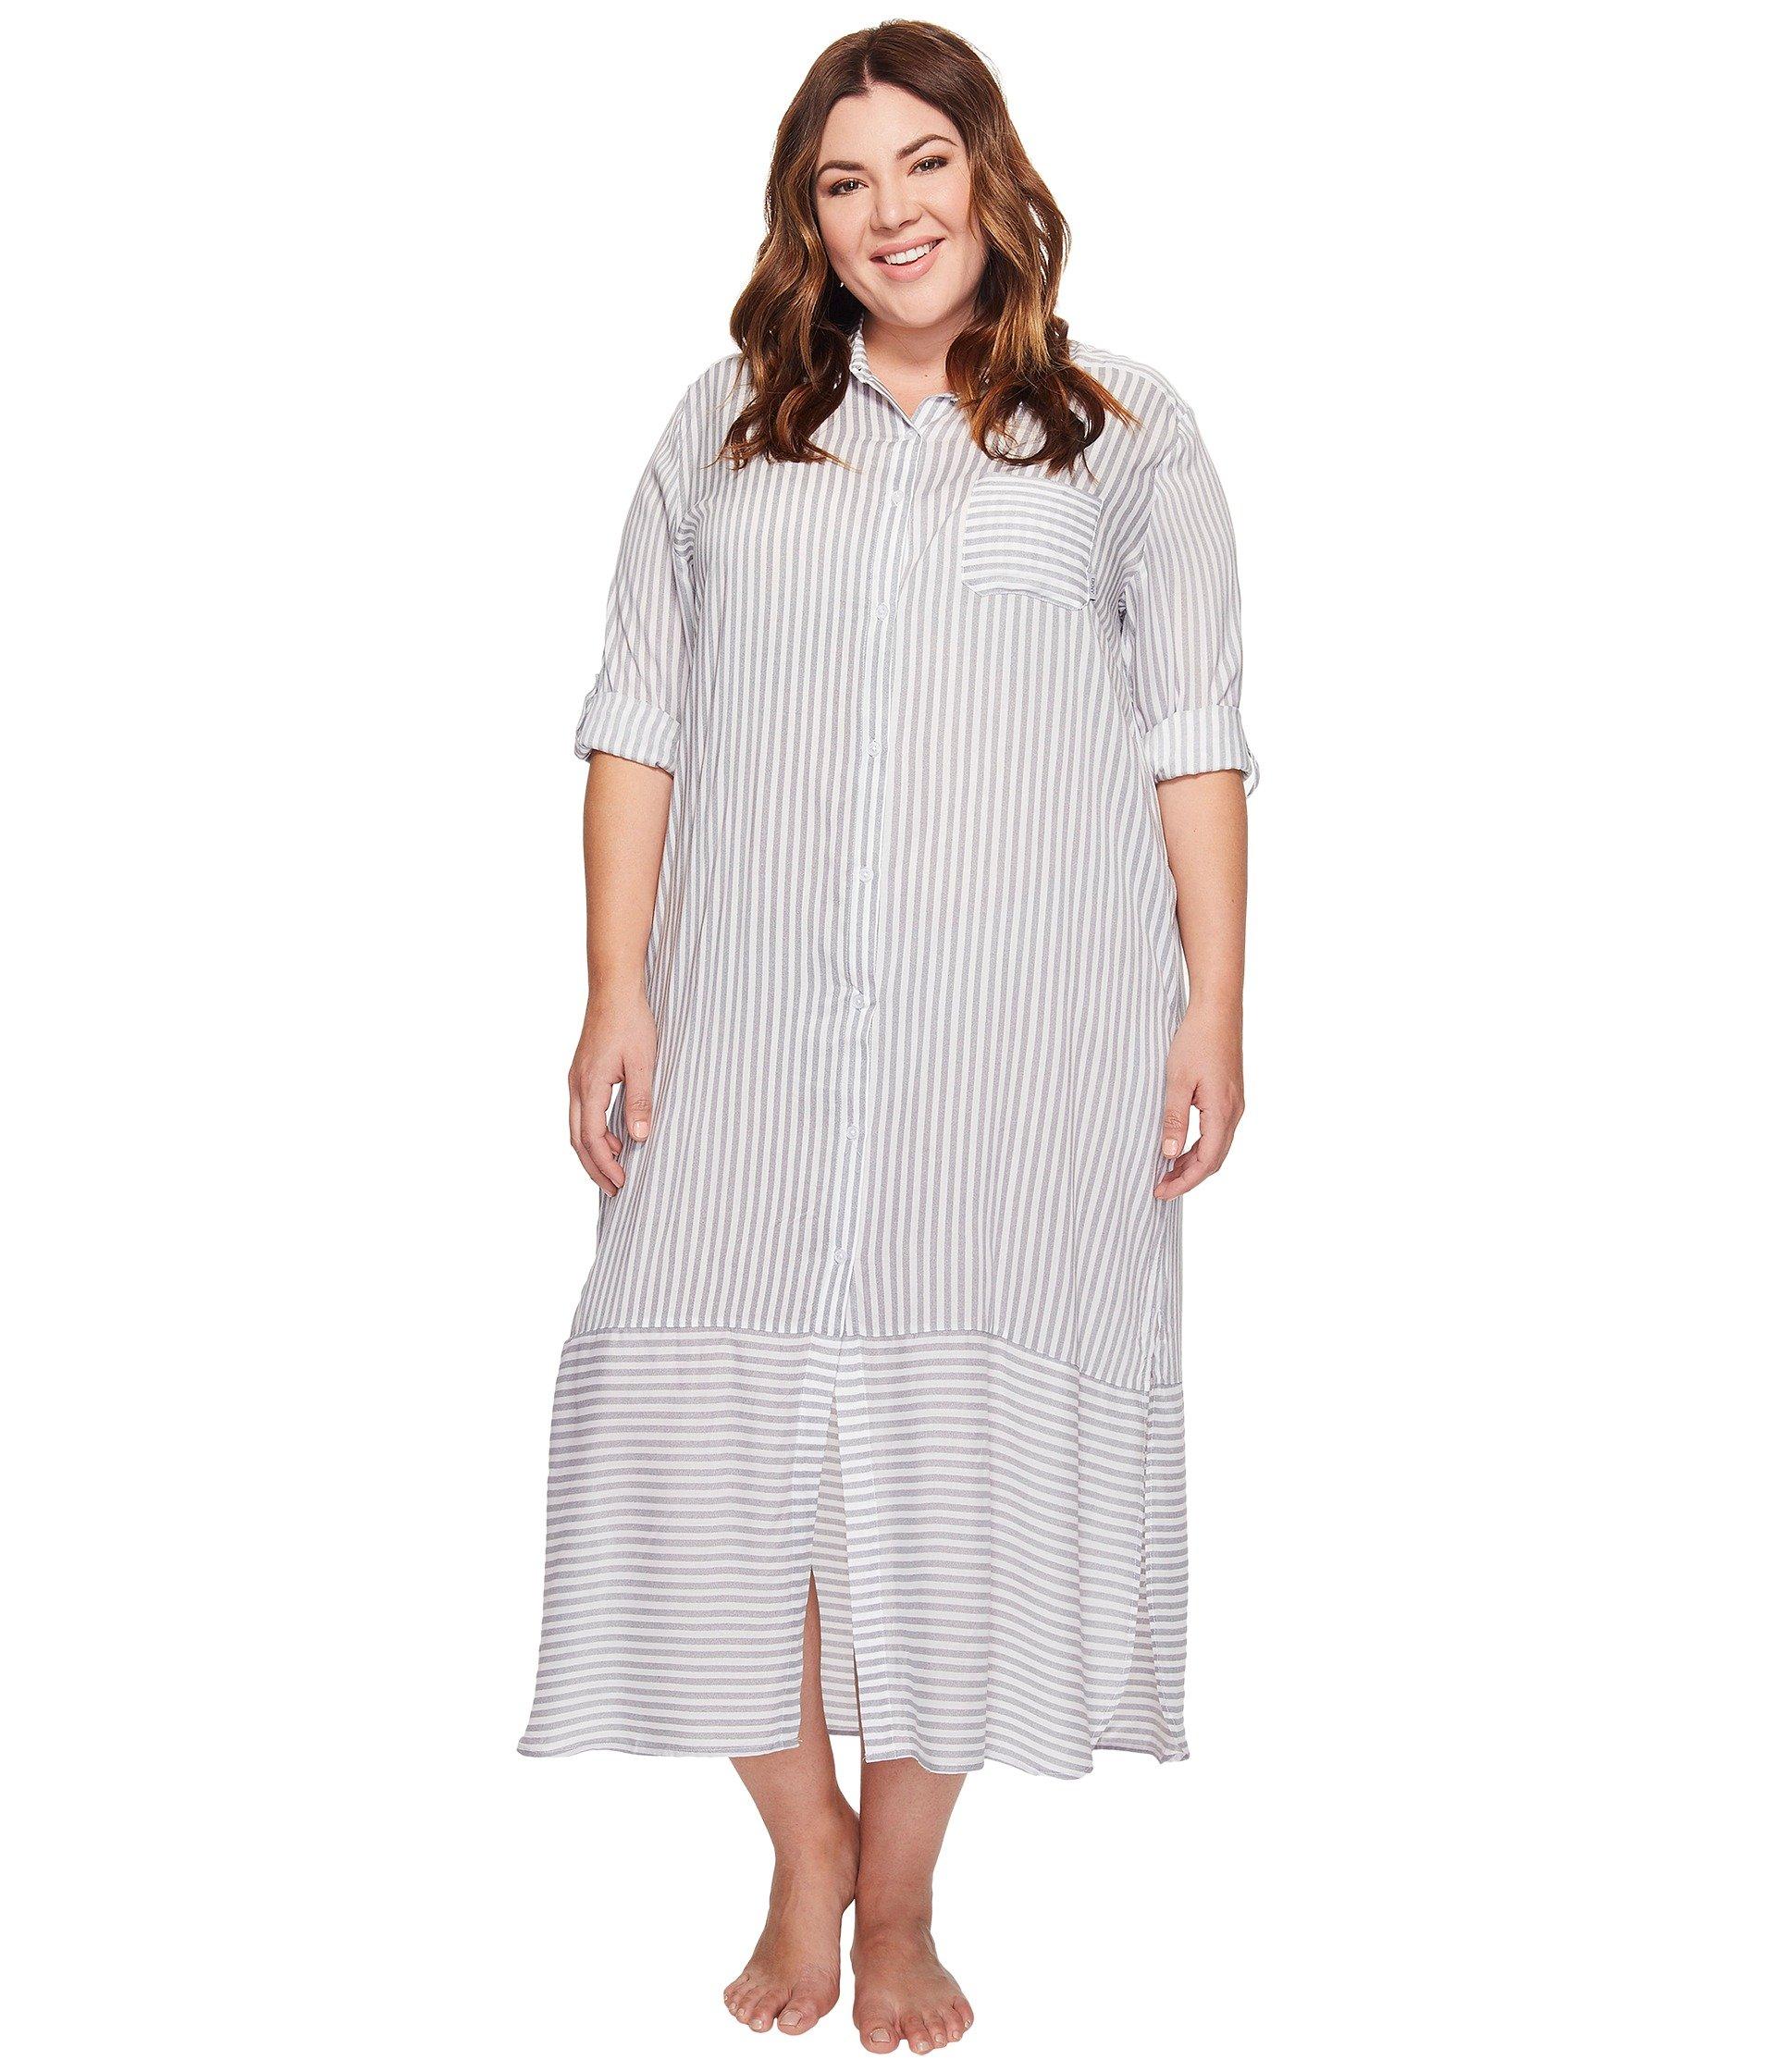 Babydoll DKNY Plus Size Fashion Long sleeve Sleep Maxi  + DKNY en VeoyCompro.net